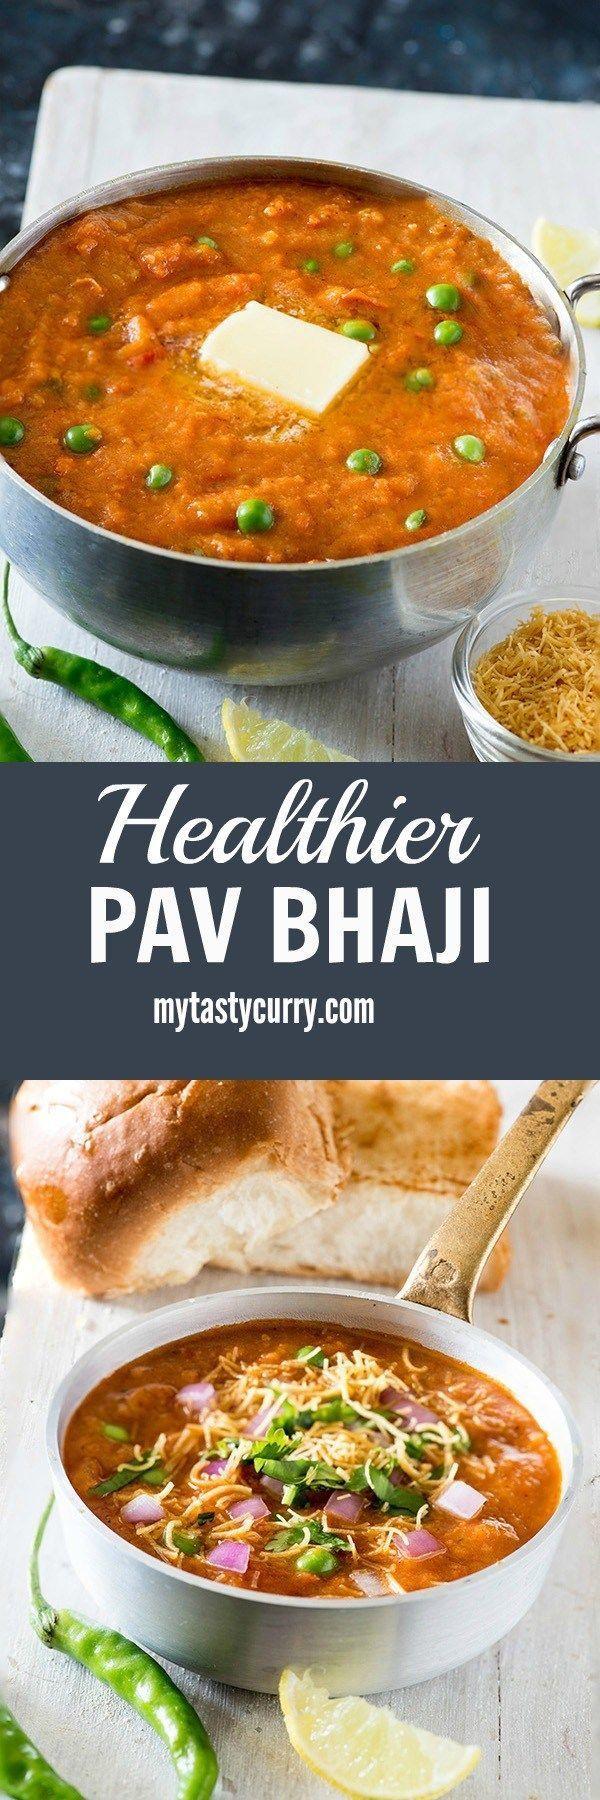 healthy pav bhaji recipe, In this recipe This Mumbai Street food classic is made healthier way